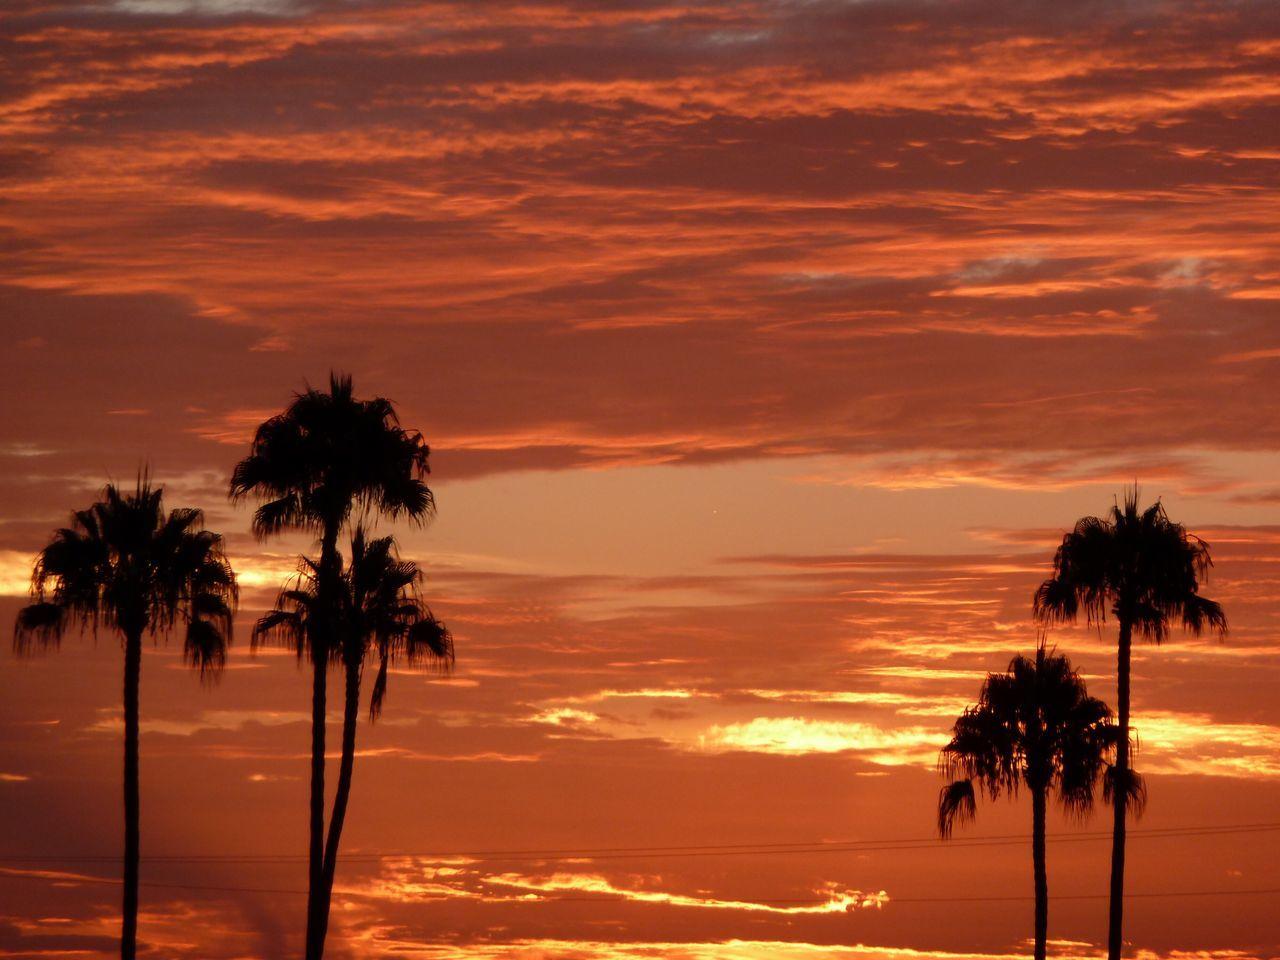 Sunrise Orange Sky Palm Trees Dramatic Sky Dramatic Sunrise No Filter Palm Tree Silhouette Catalina Island